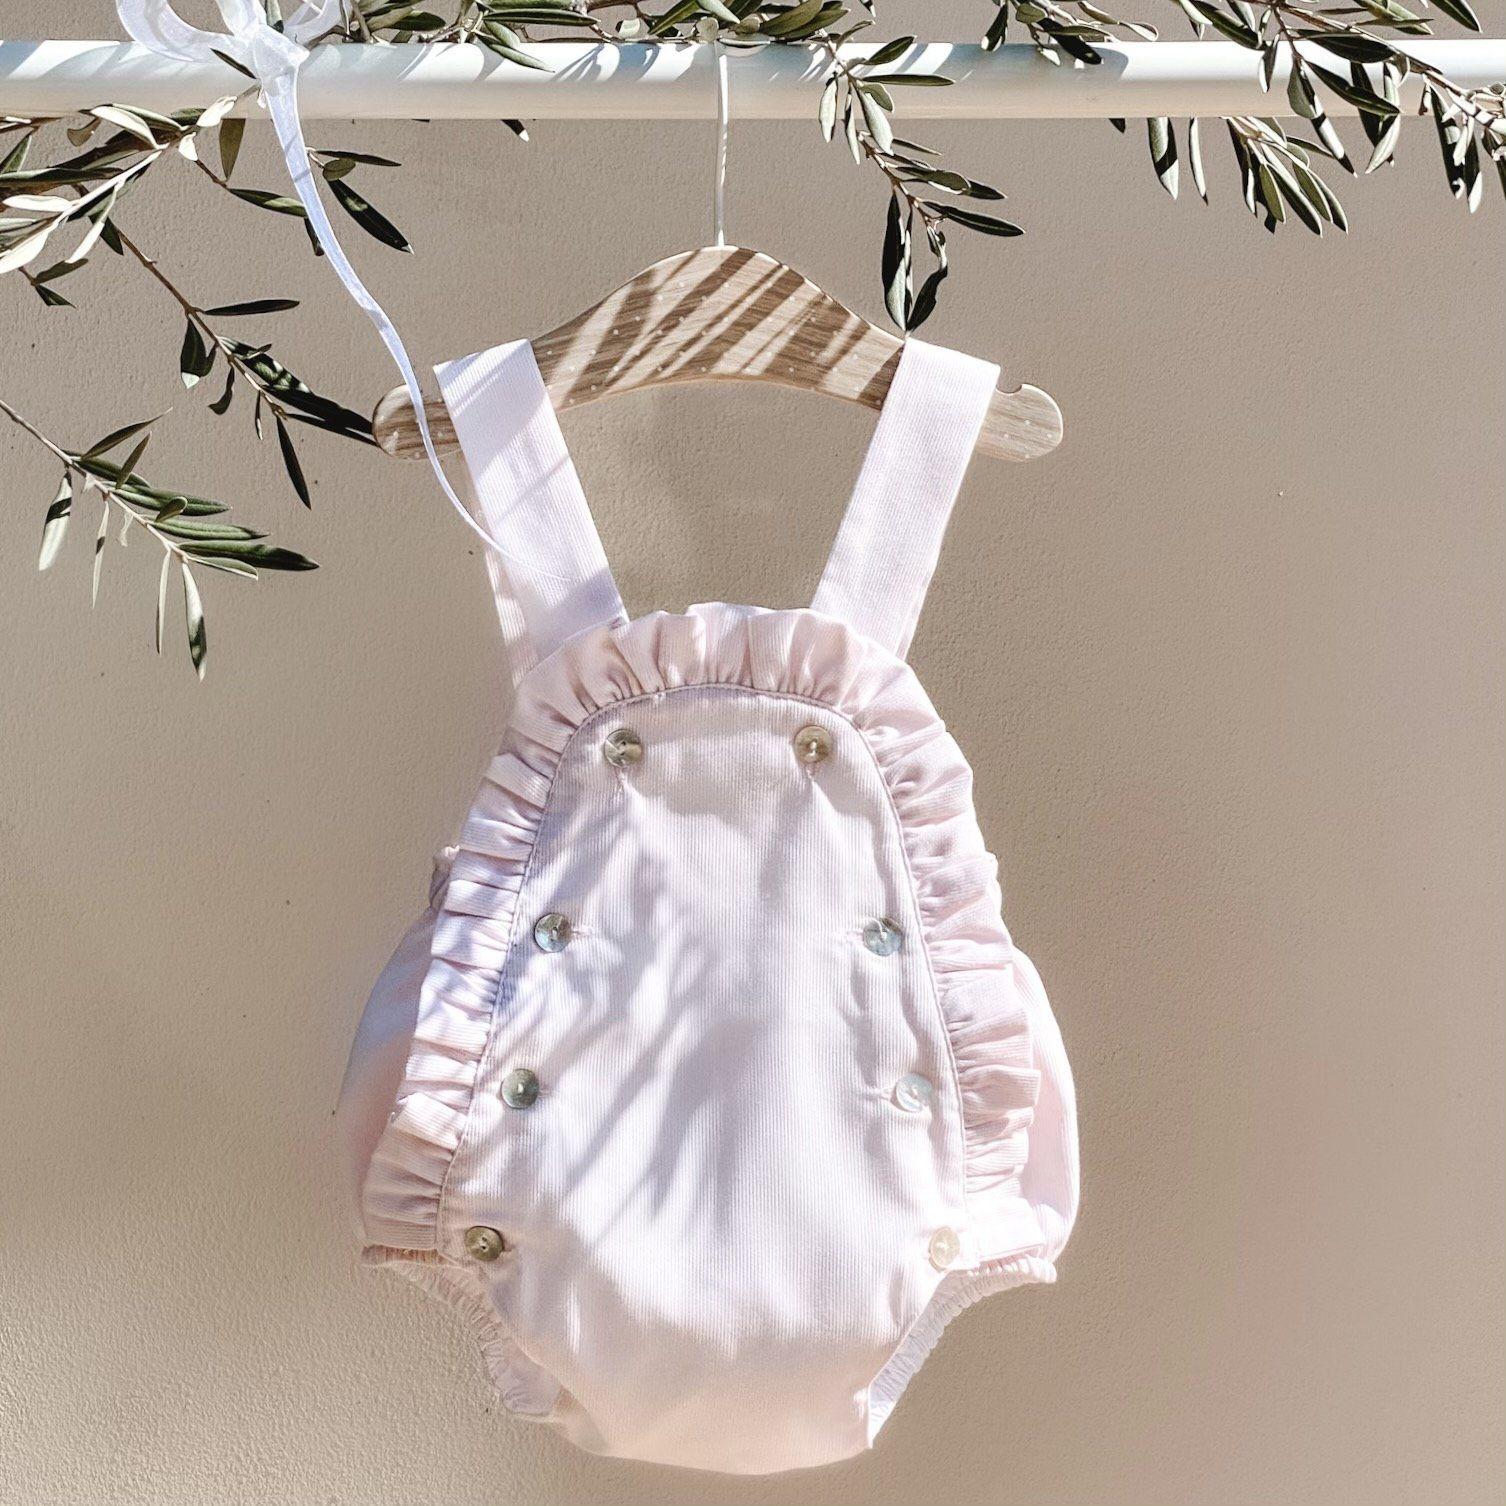 Rosetta Romper + Bonnet - Newborn